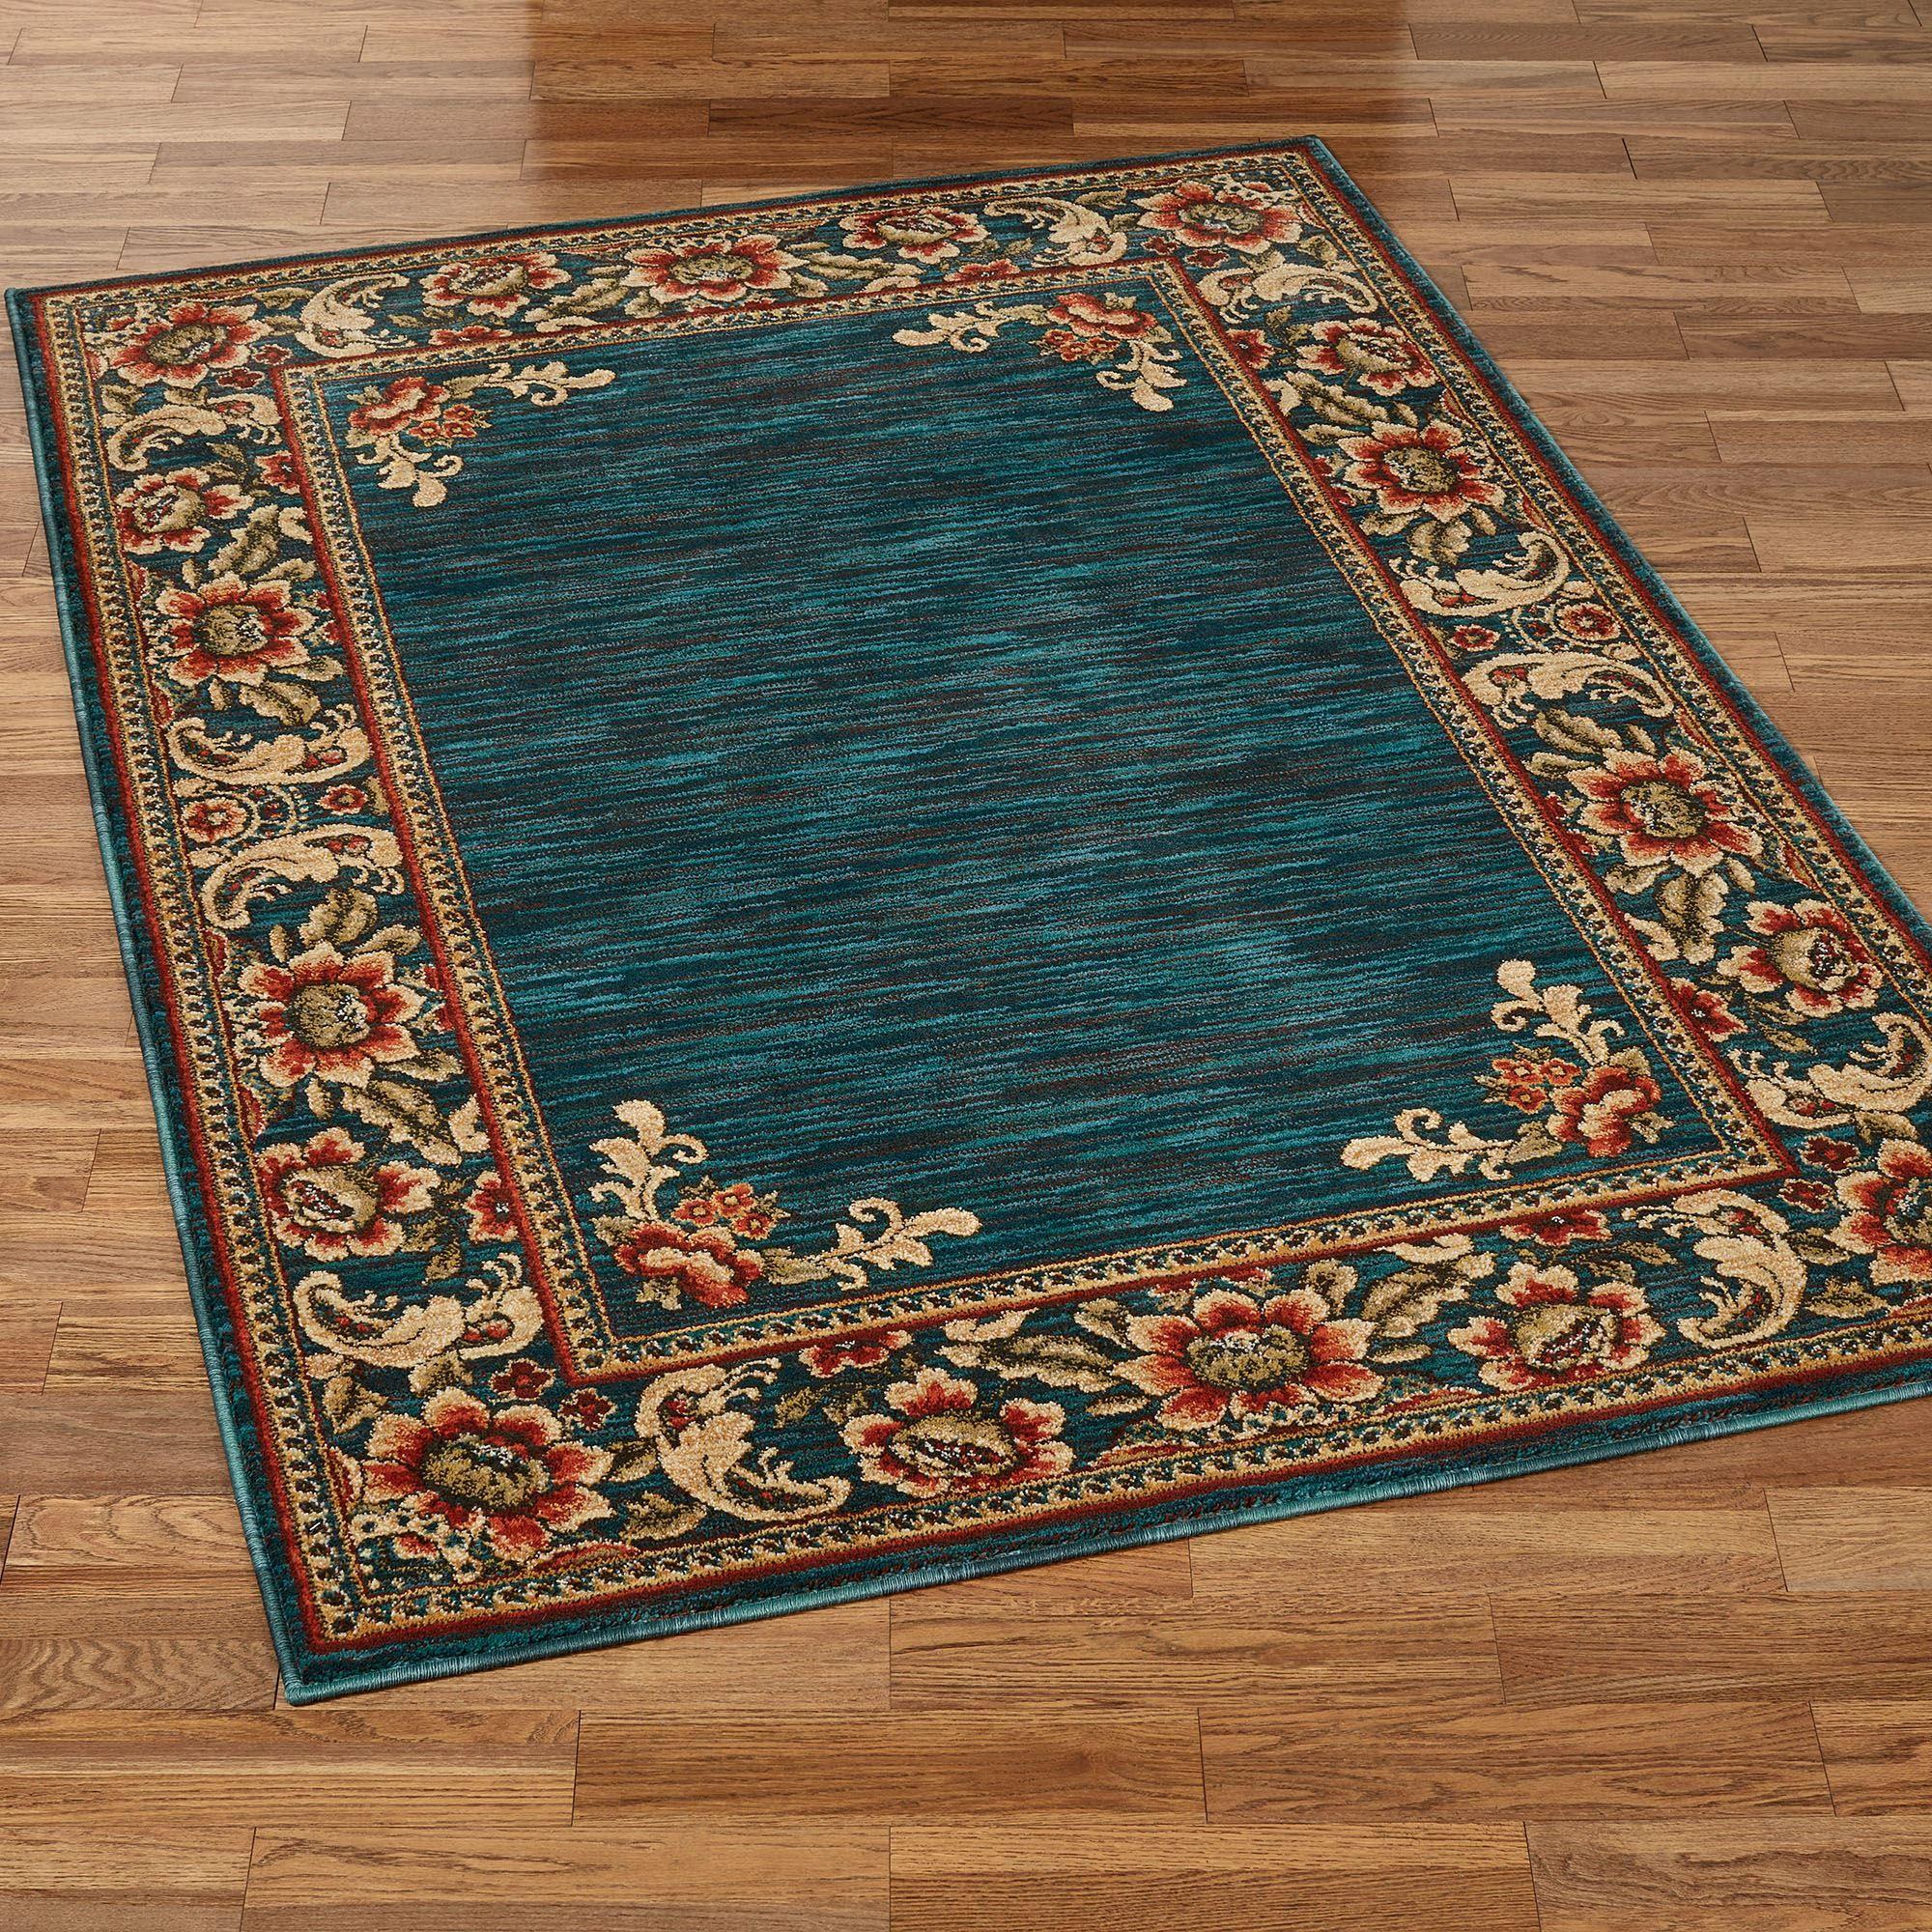 florian border jacobean floral dark teal area rugs. Black Bedroom Furniture Sets. Home Design Ideas